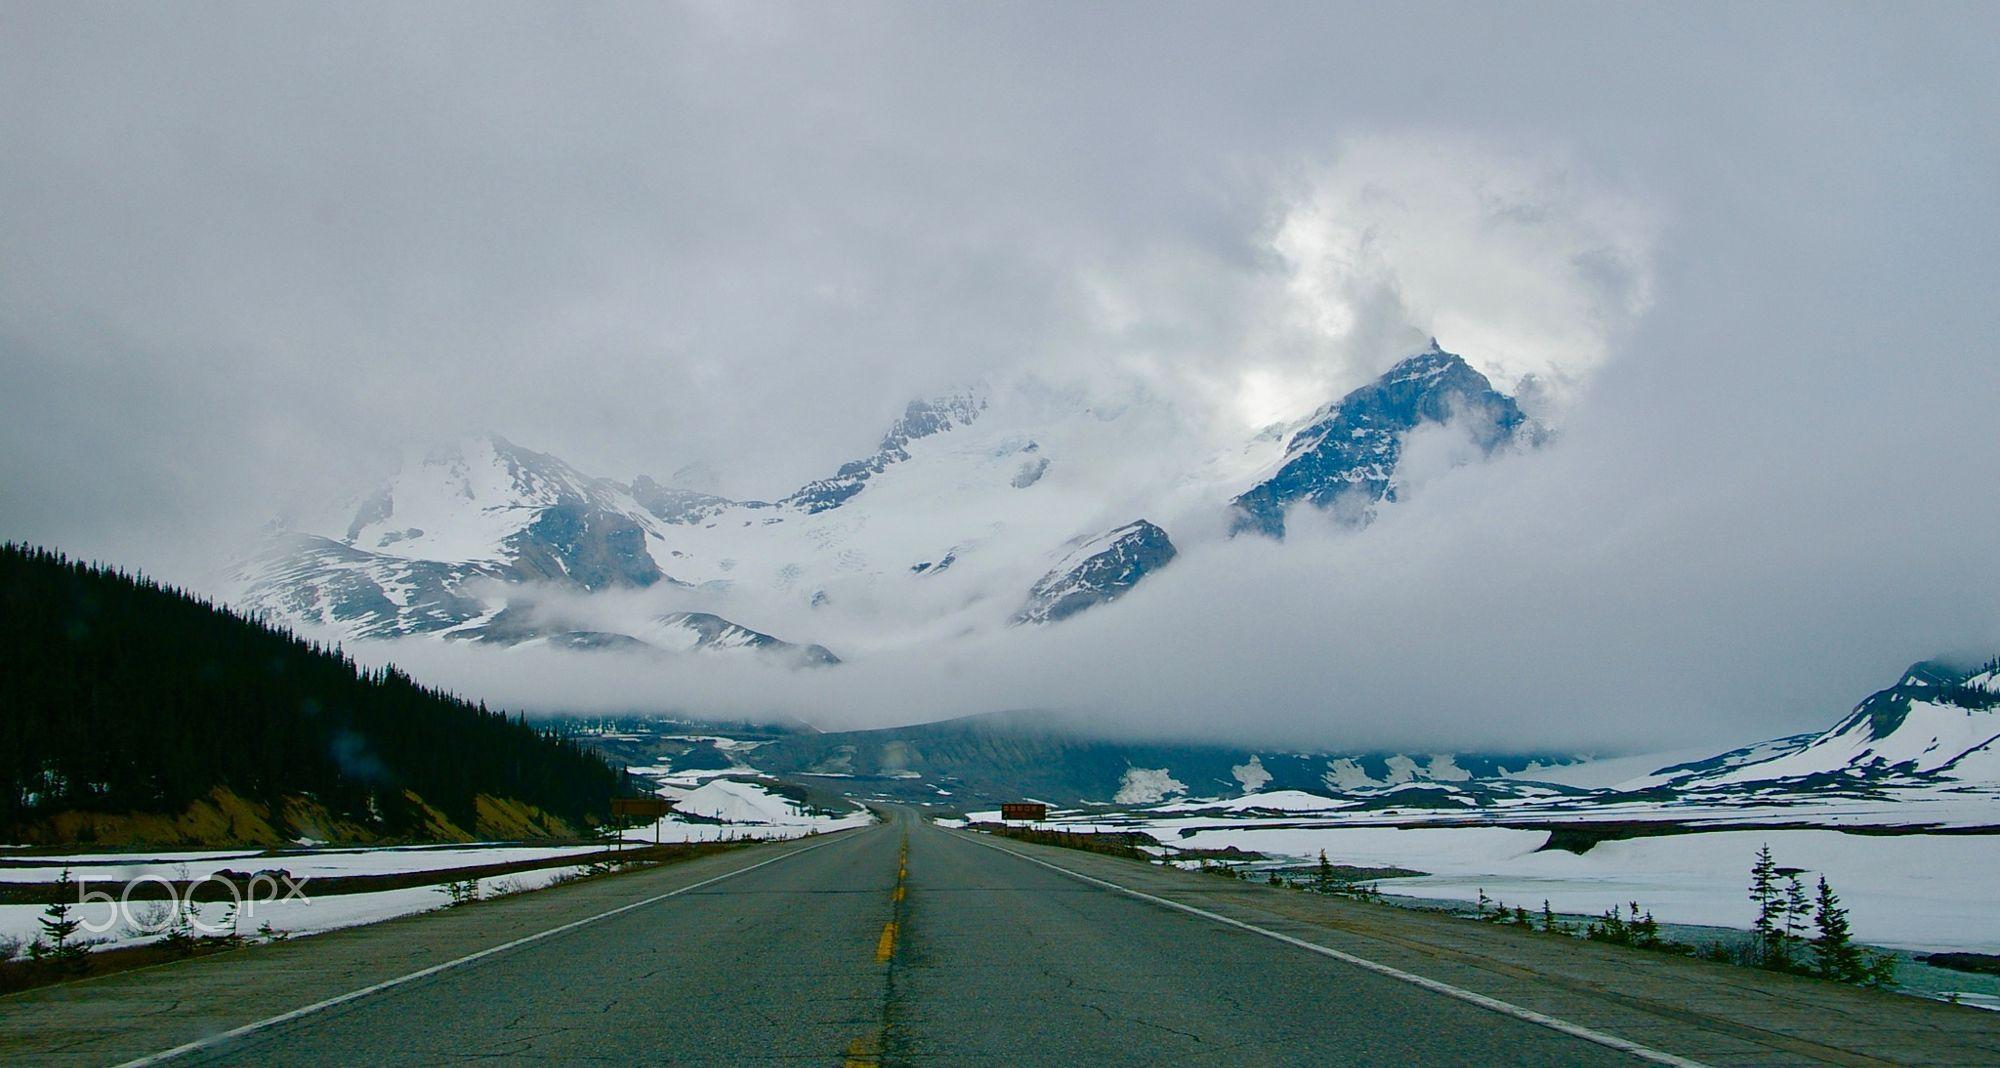 Road To Jasper  Travel photo by kchangleek http://rarme.com/?F9gZi